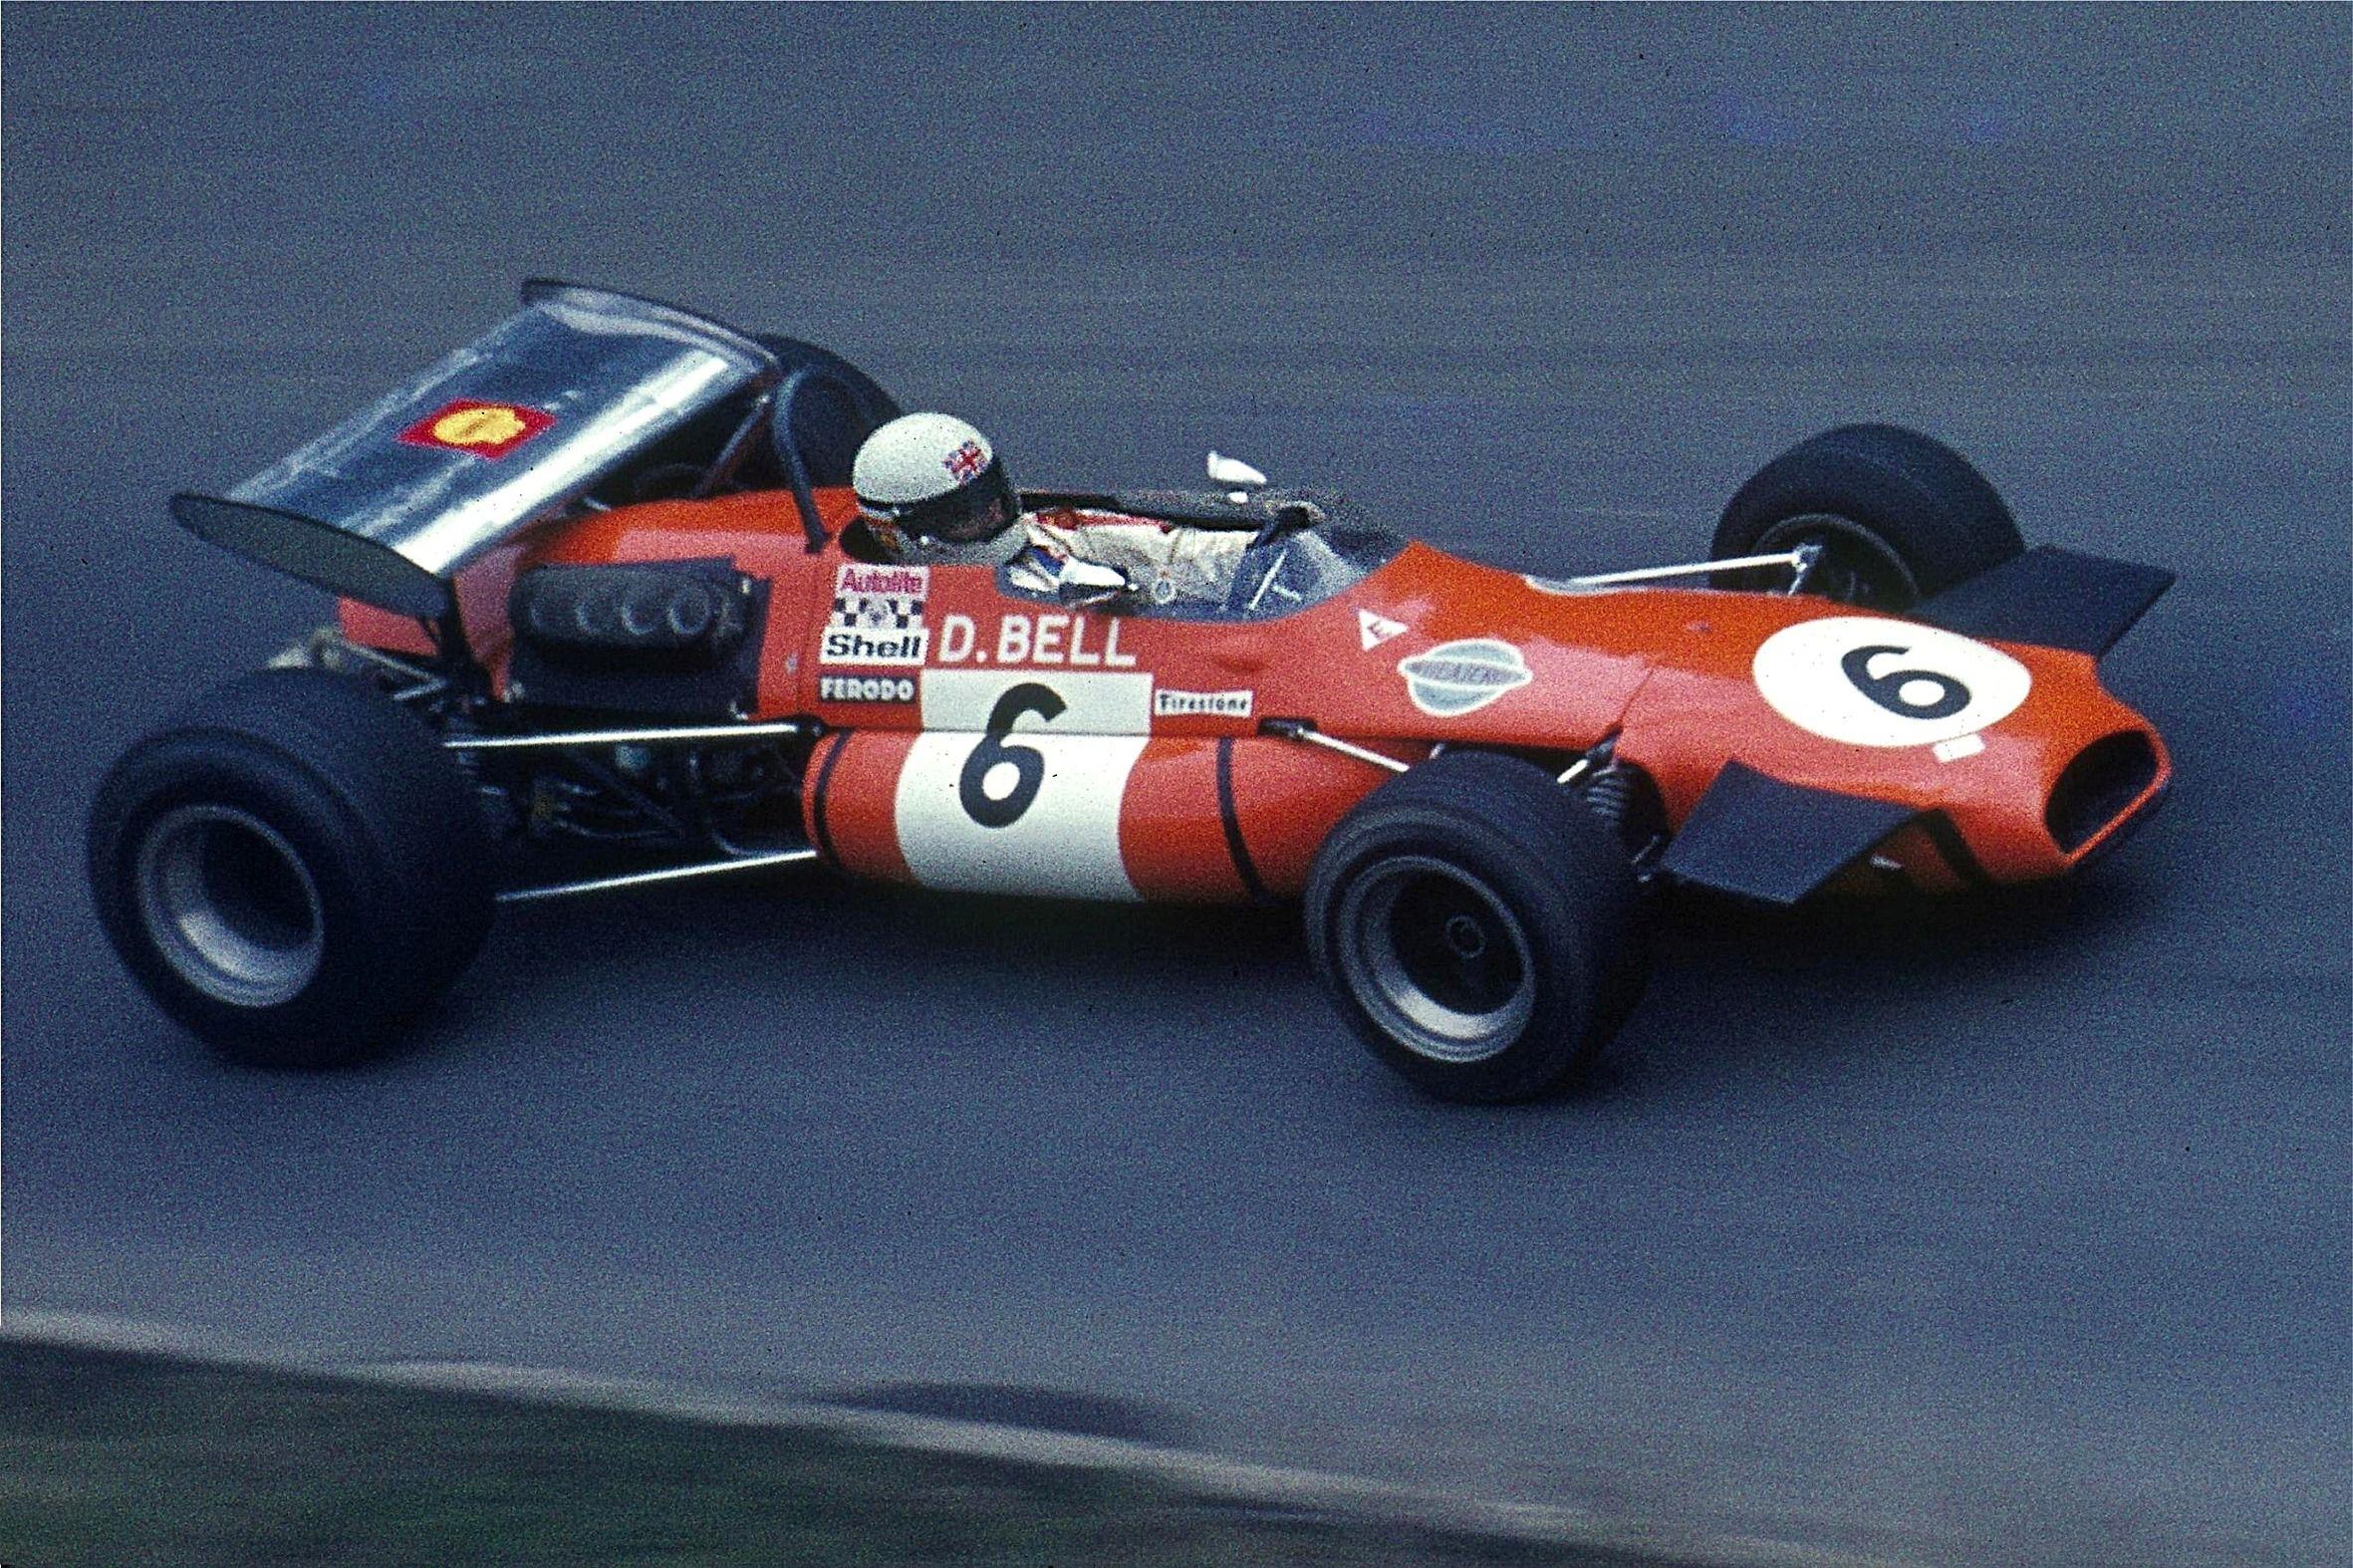 Derek bell racing race cars f1 racing